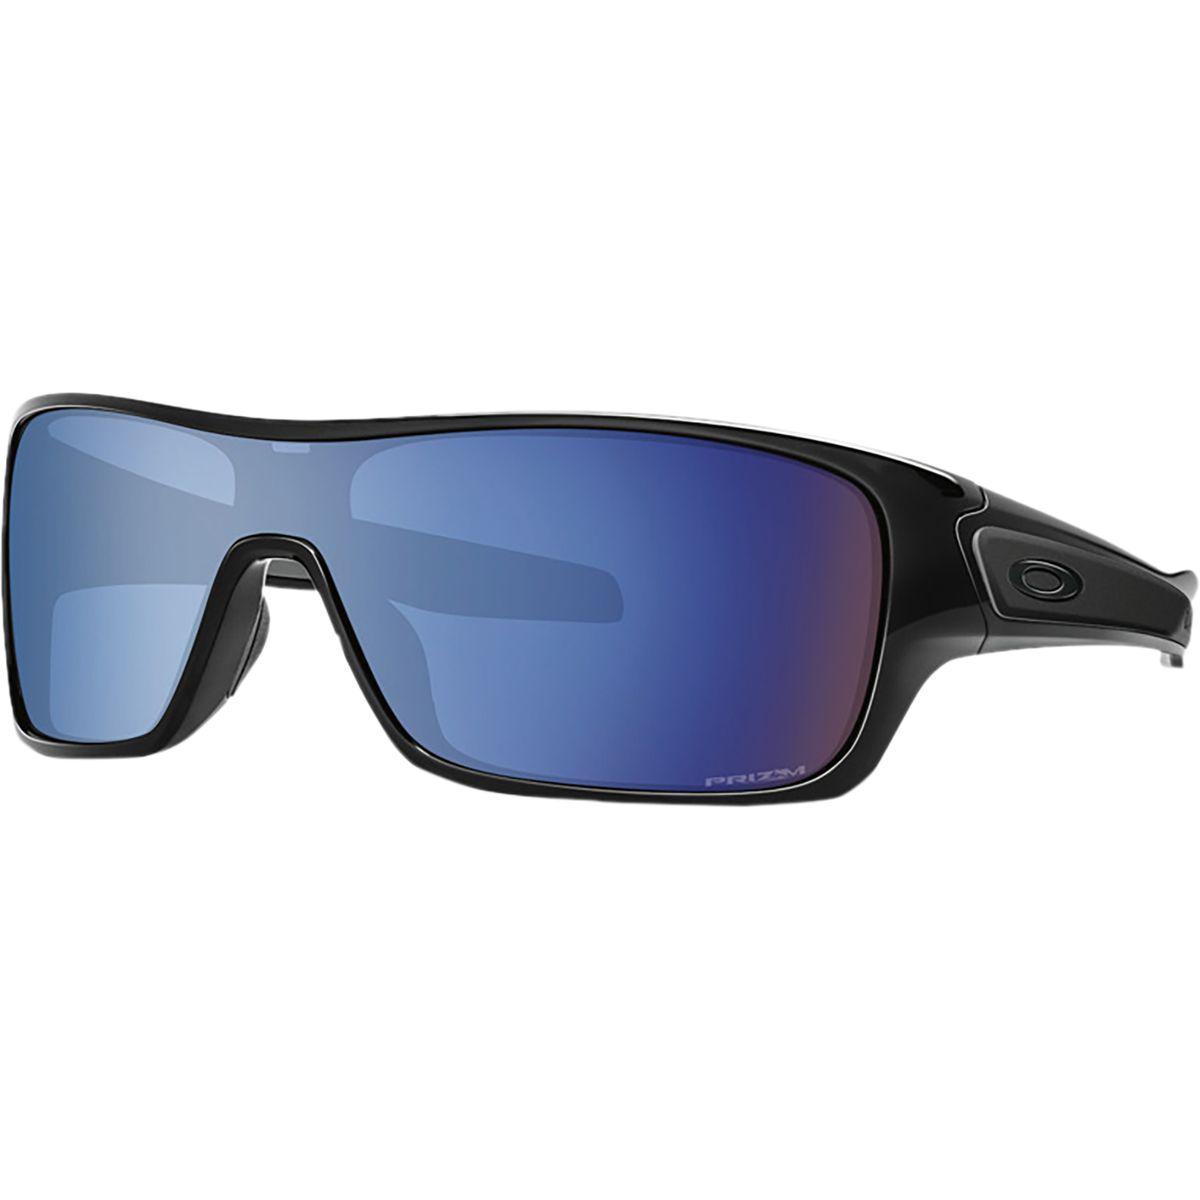 f017ec62dd Lyst - Oakley Turbine Rotor Prizm Sunglasses in Blue for Men